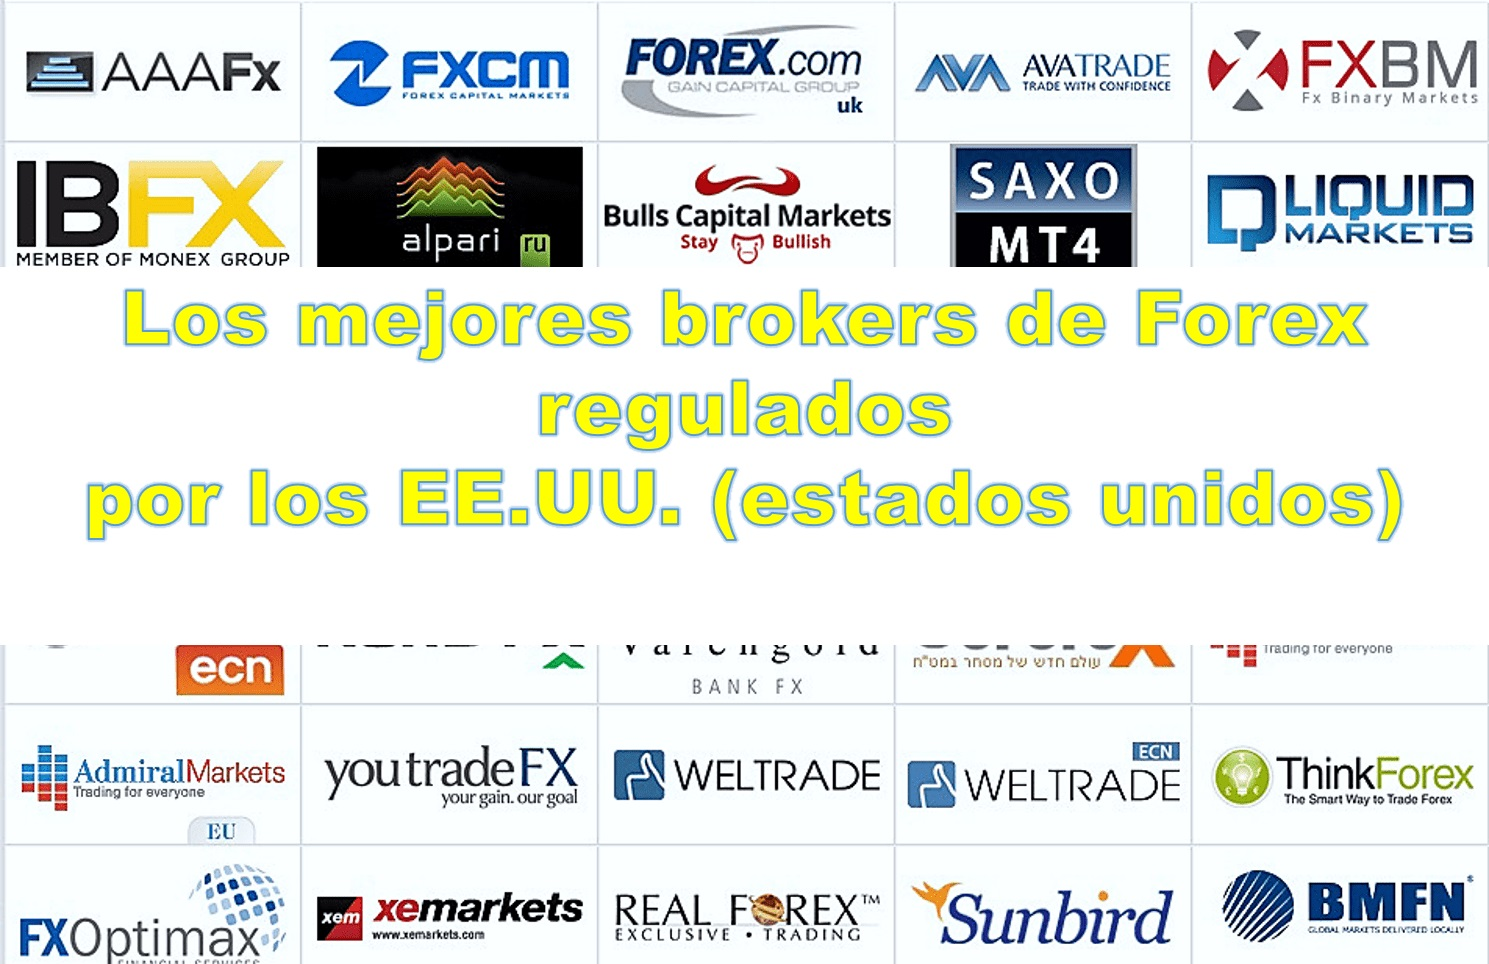 listă de brokeri forex regulados